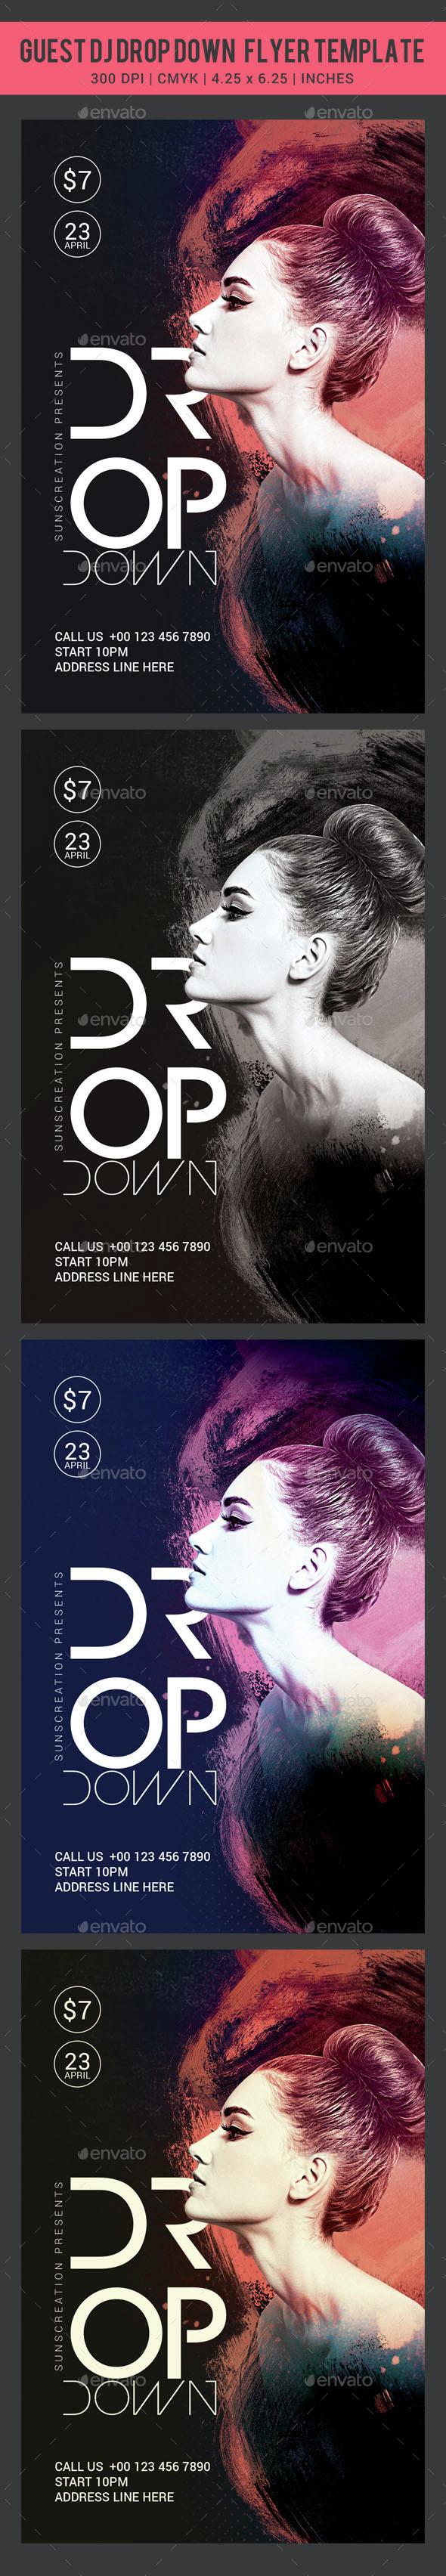 Guest Dj Drop Down Flyer Template - Clubs & Parties Events